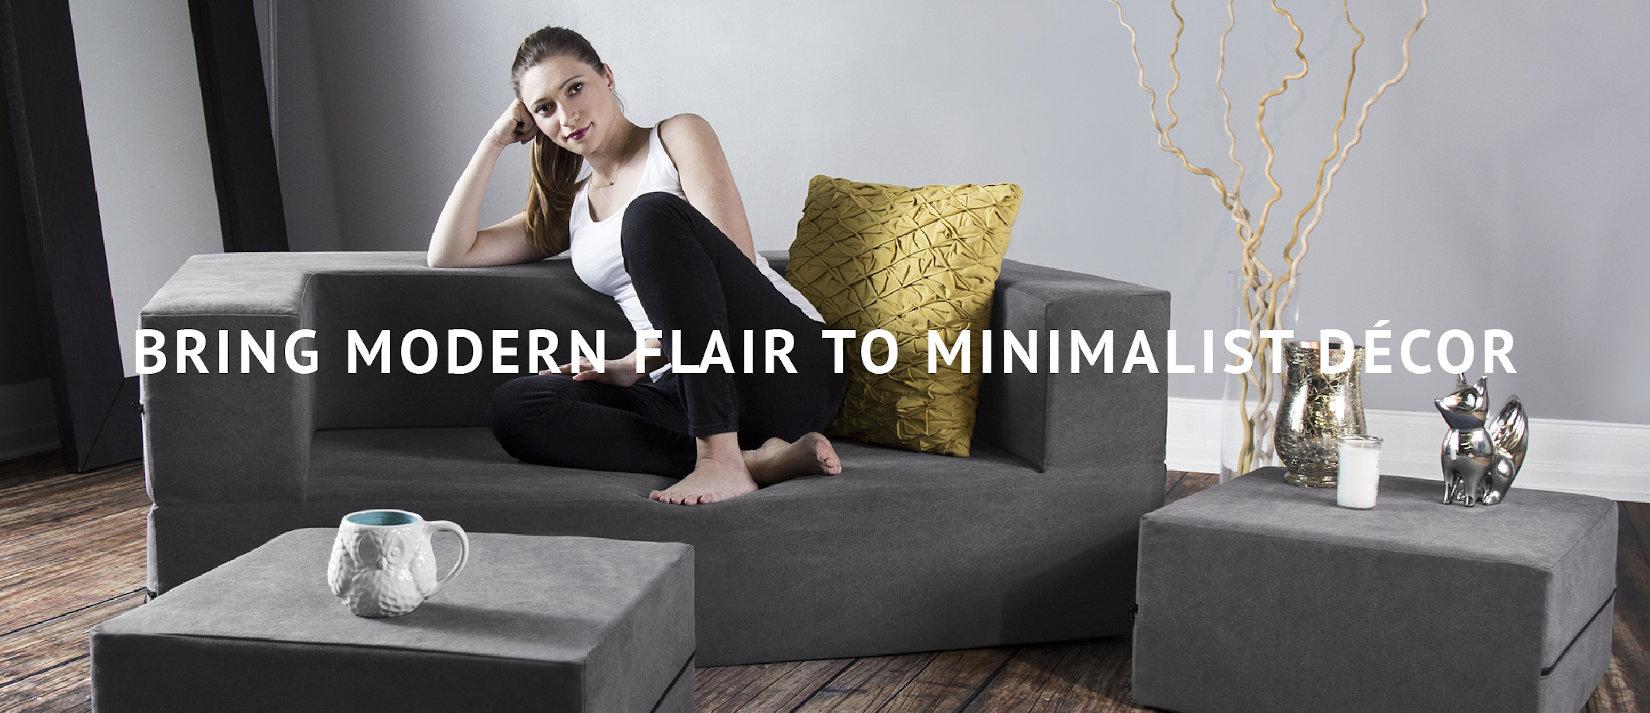 Bring Modern Flair to Minimalist Decor | Woman relaxing on Zipline Convertible Loveseat